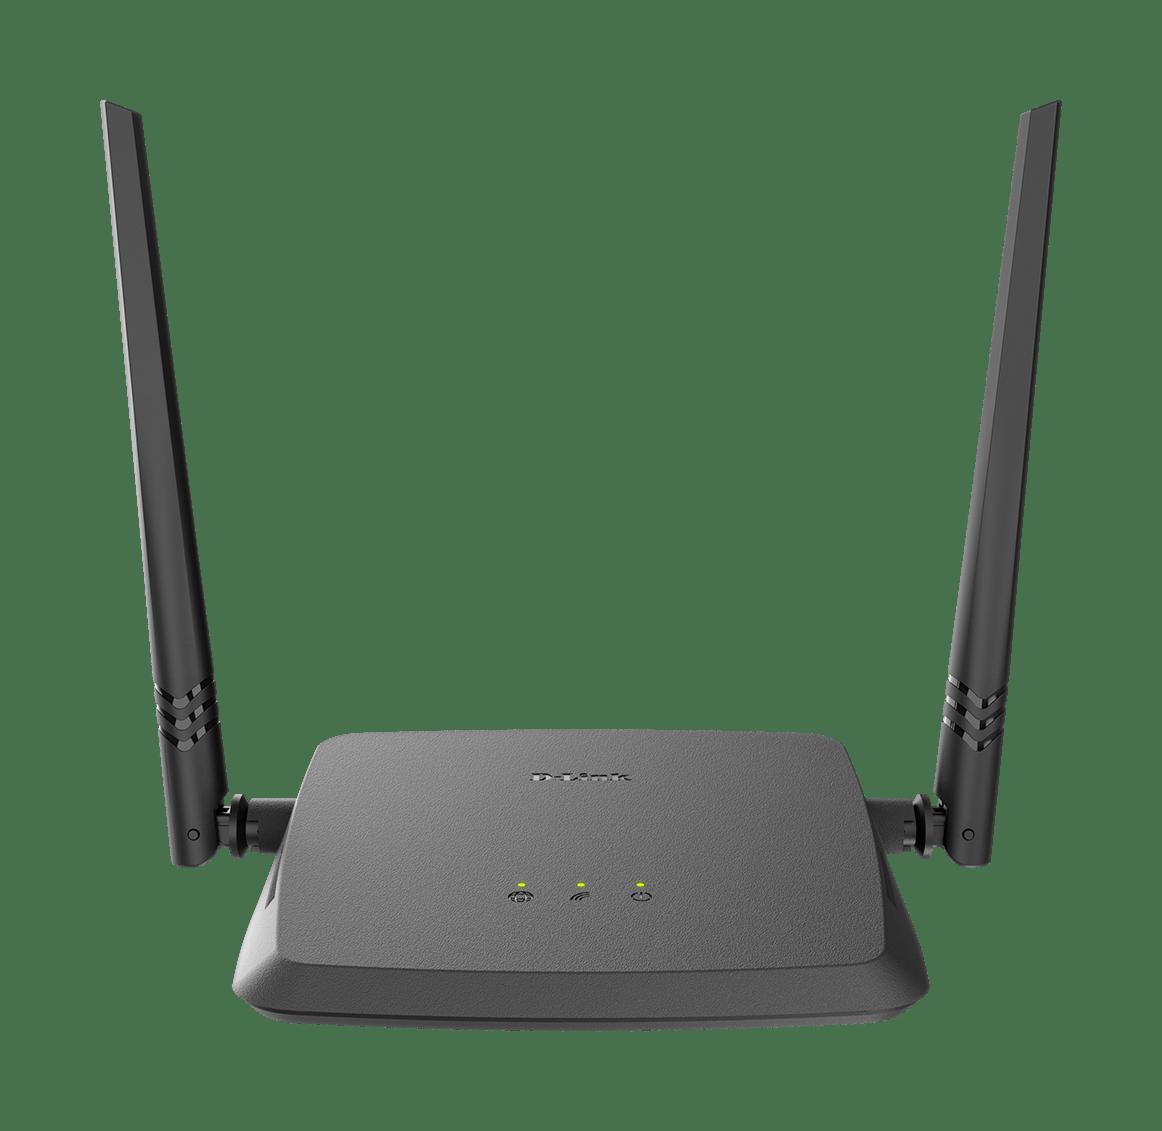 DIR 615 X1 Roteador Wireless N 300Mbps IPv6